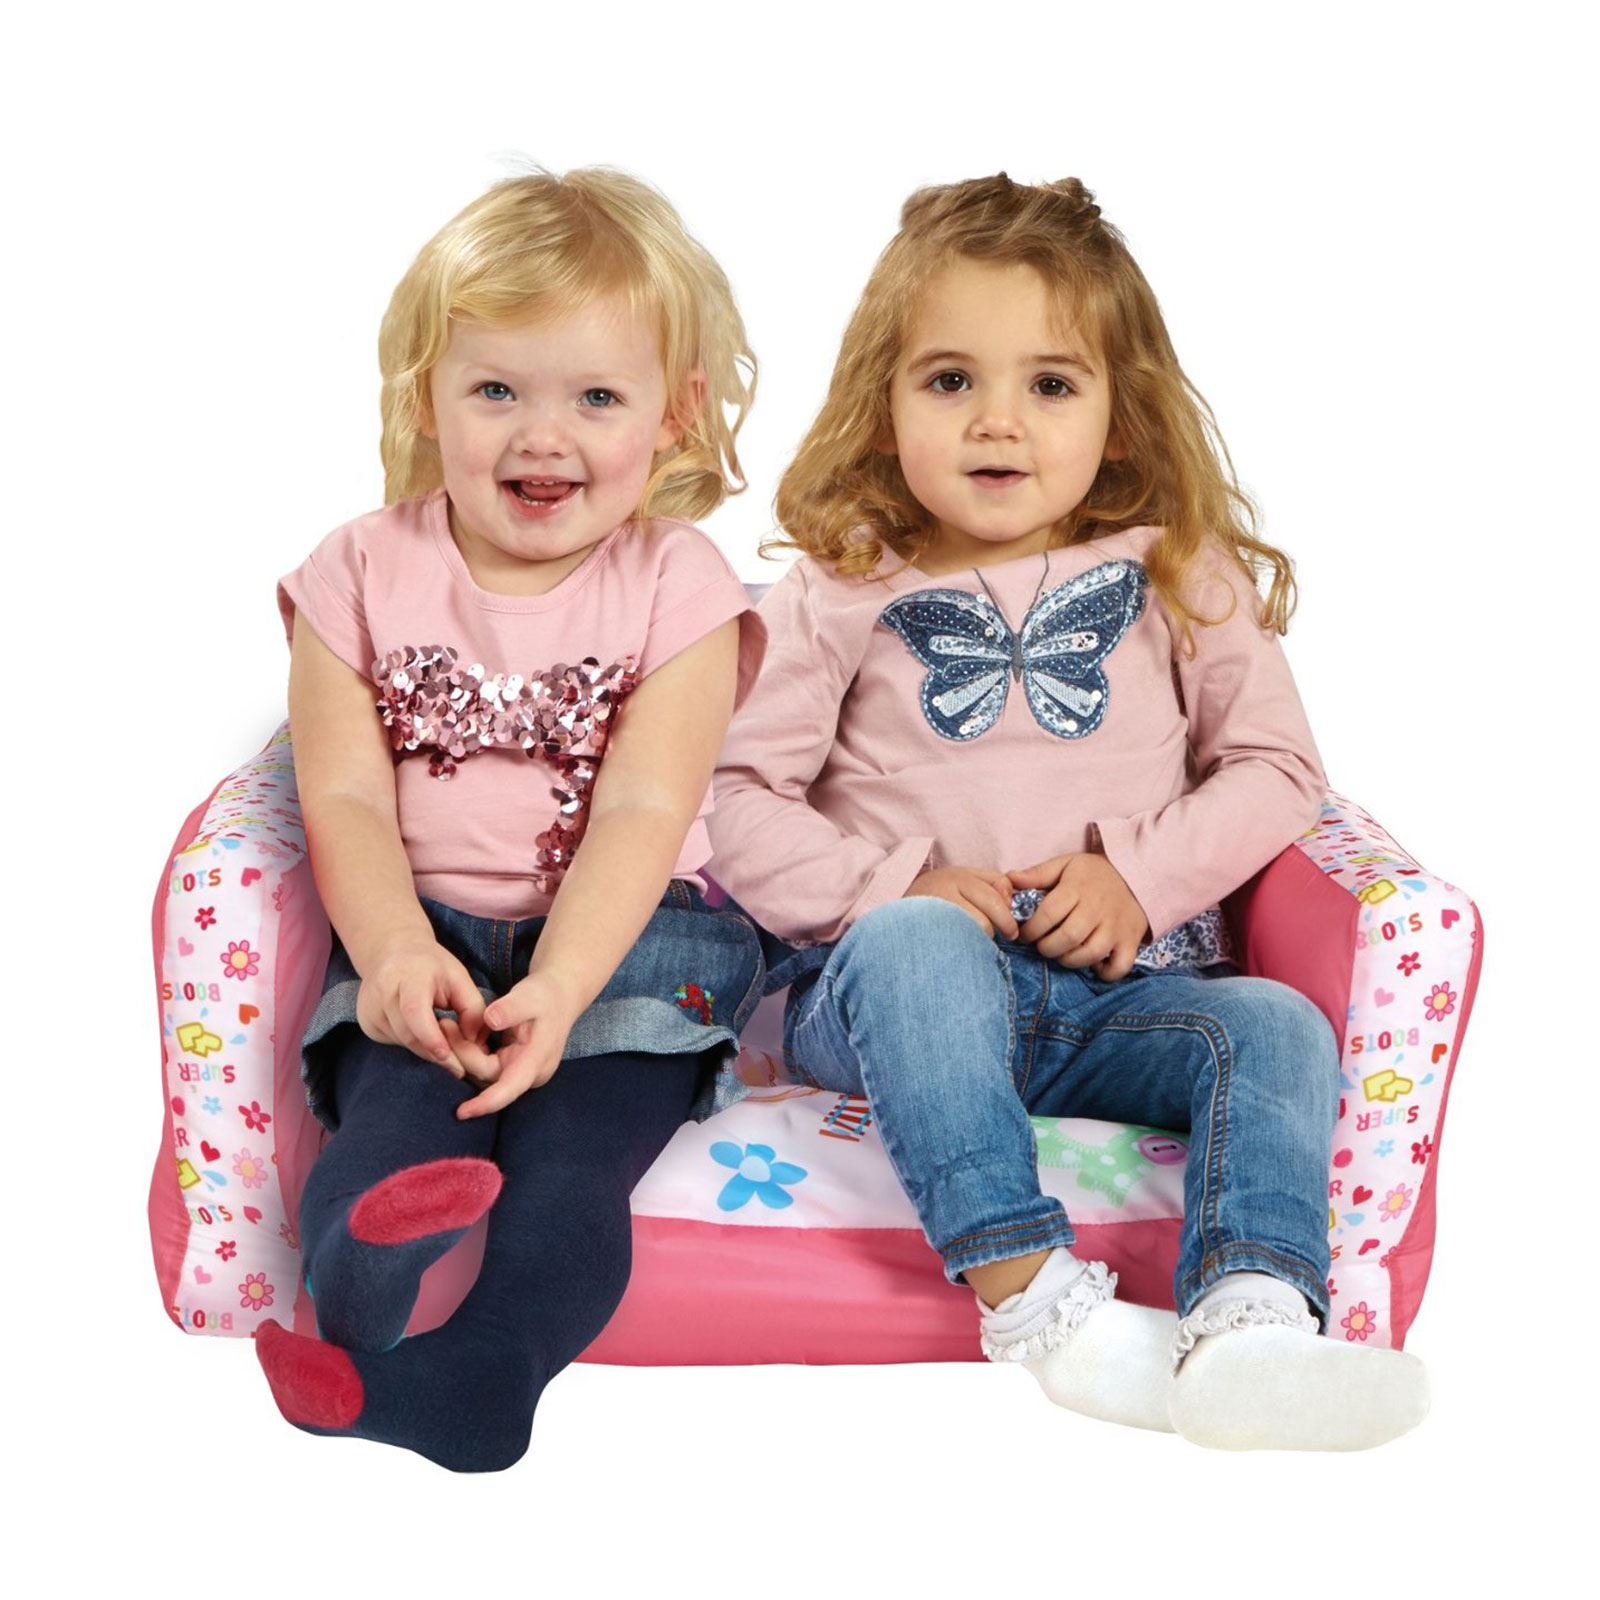 disney cars flip out sofa australia grey rattan outdoor range inflatable kids room new minions